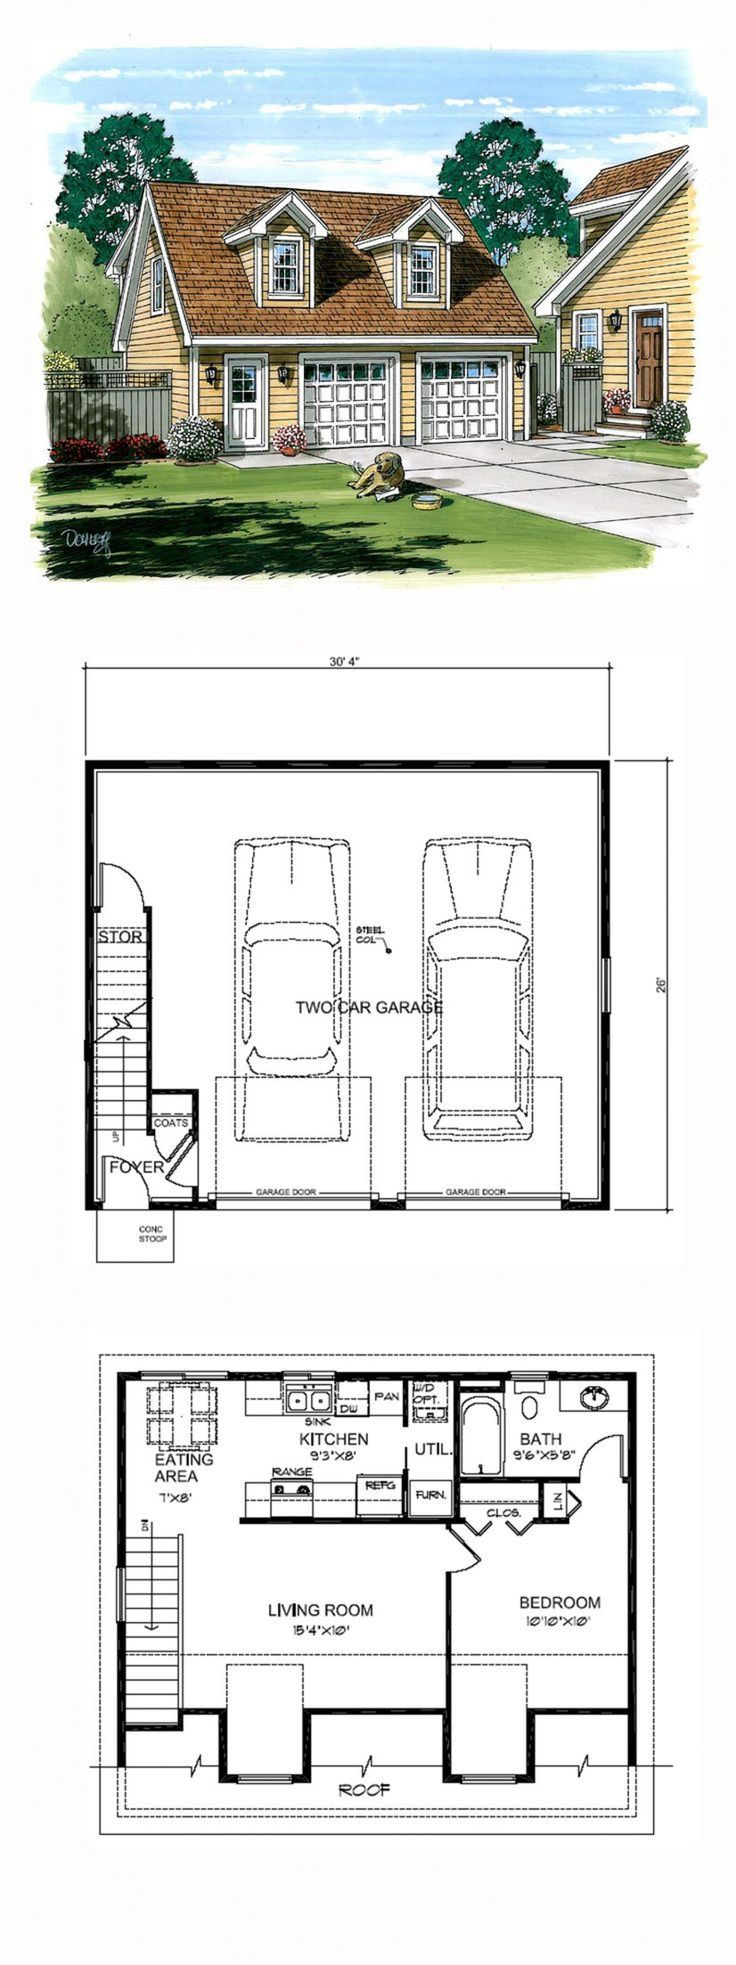 Garage apartments plans best interior house paint check for Contemporary garage apartment plans